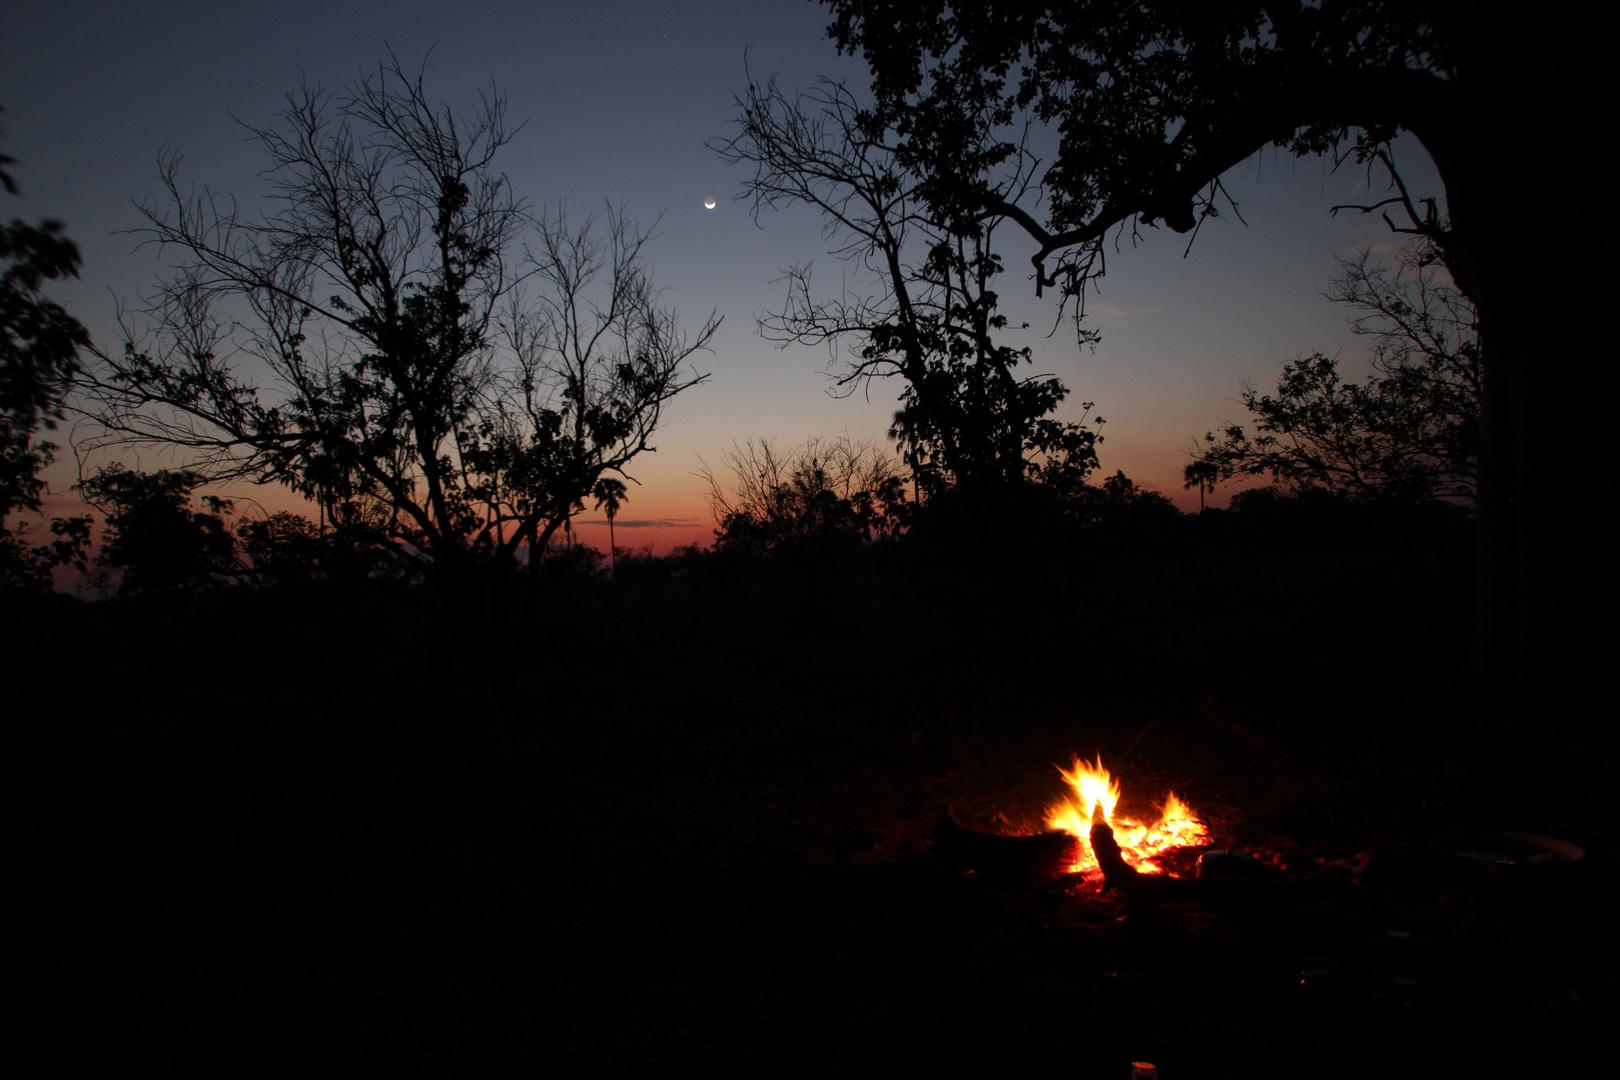 Nachtstimmung im Okawango-Delta